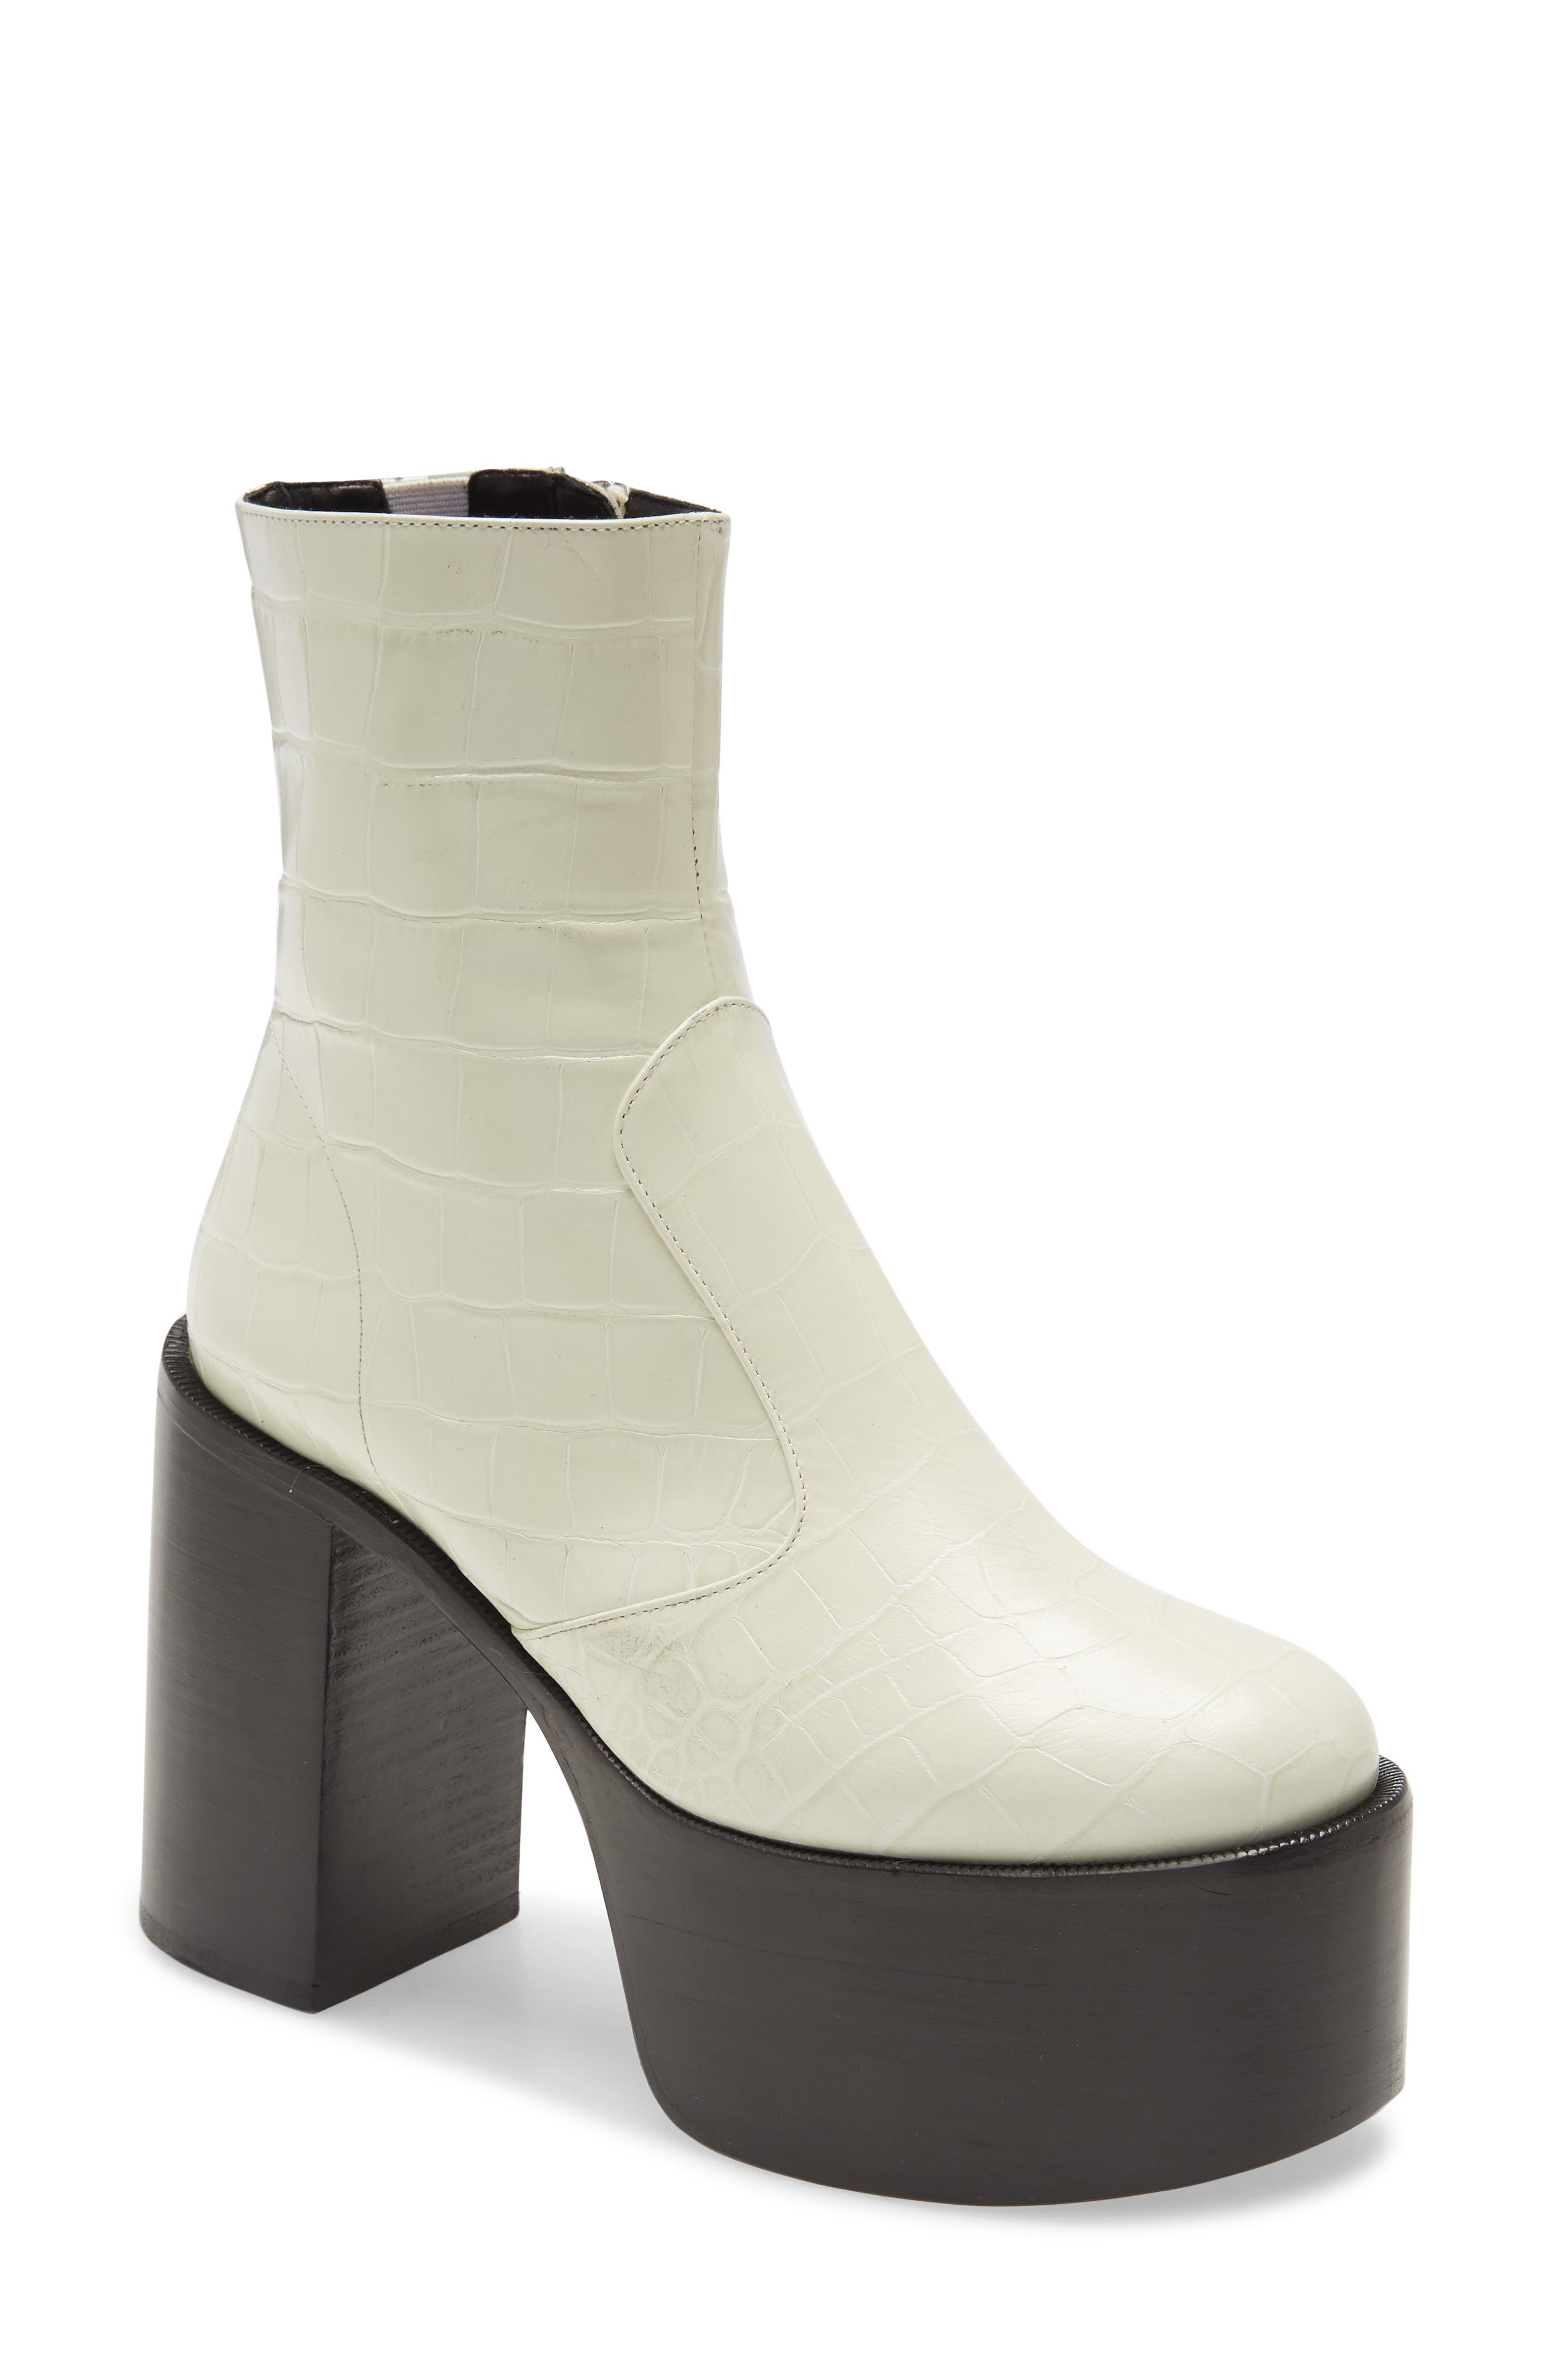 Women's Booties Simon Miller Shoes